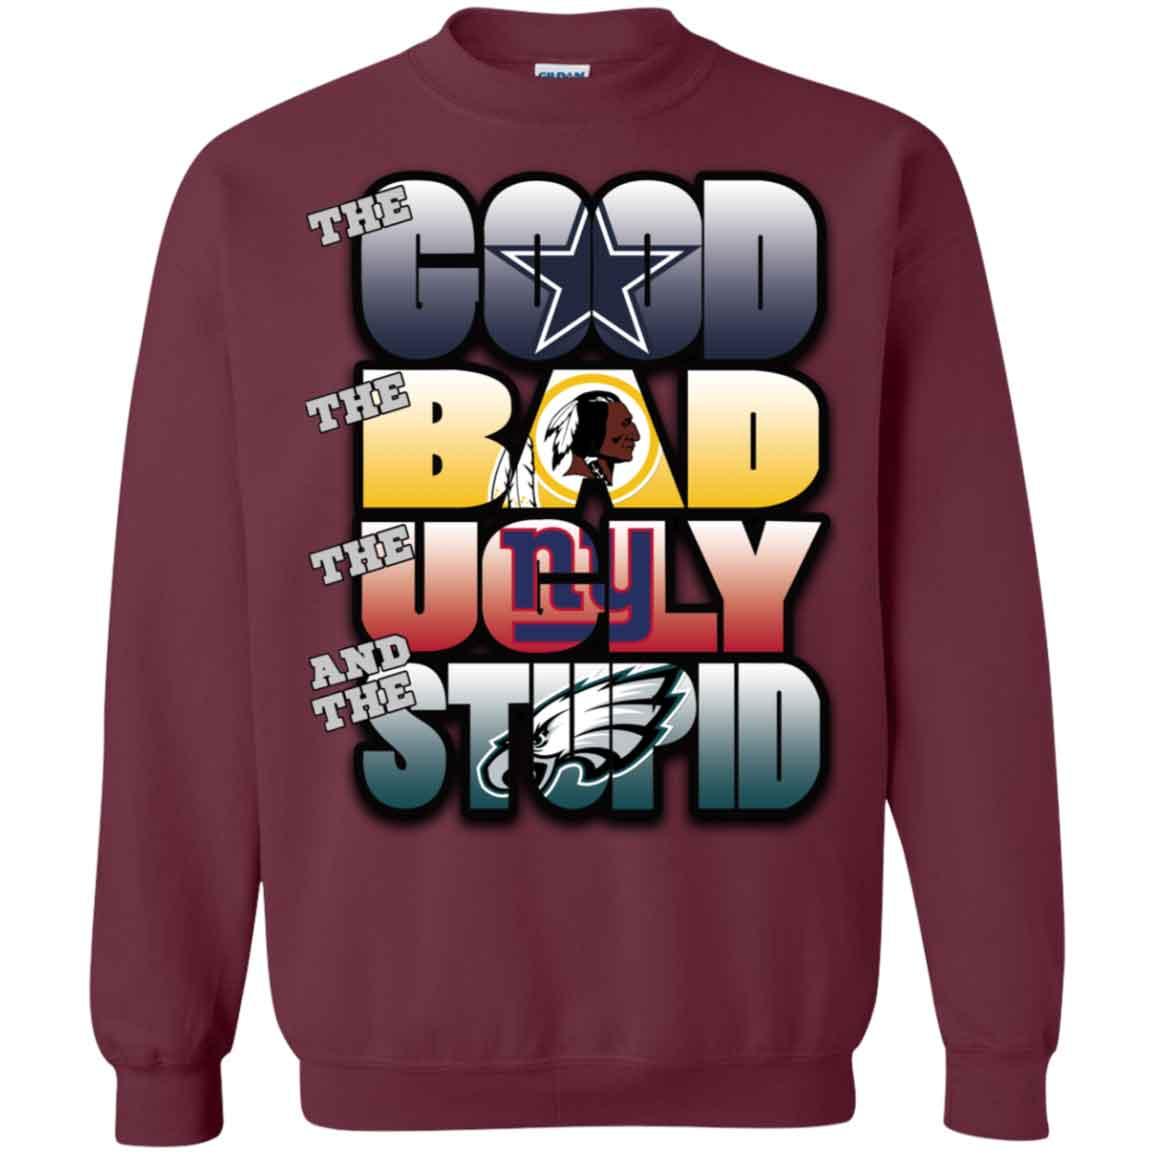 new products 7ad24 4d0d7 Washington Redskins Philadelphia Eagles Good Bad Ugly & Stupid Christmas  Ugly Sweater Hoodies Sweatshirts